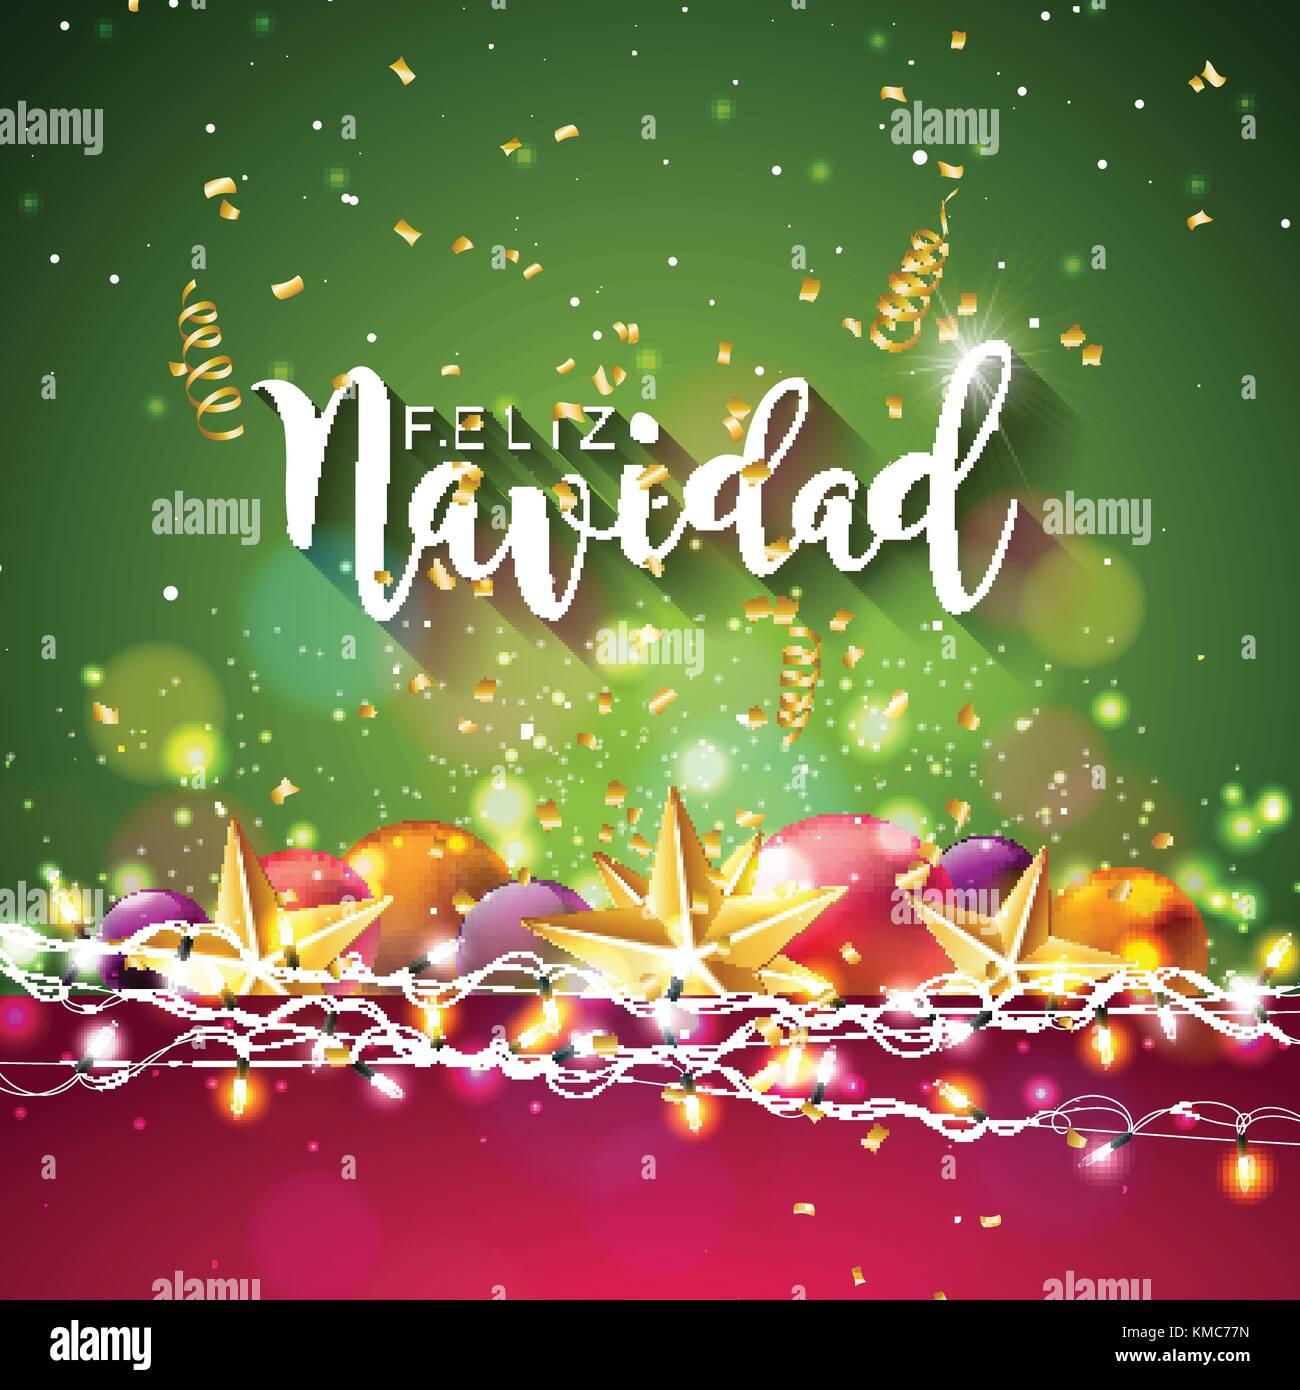 Christmas Illustration With Spanish Feliz Navidad Typography And